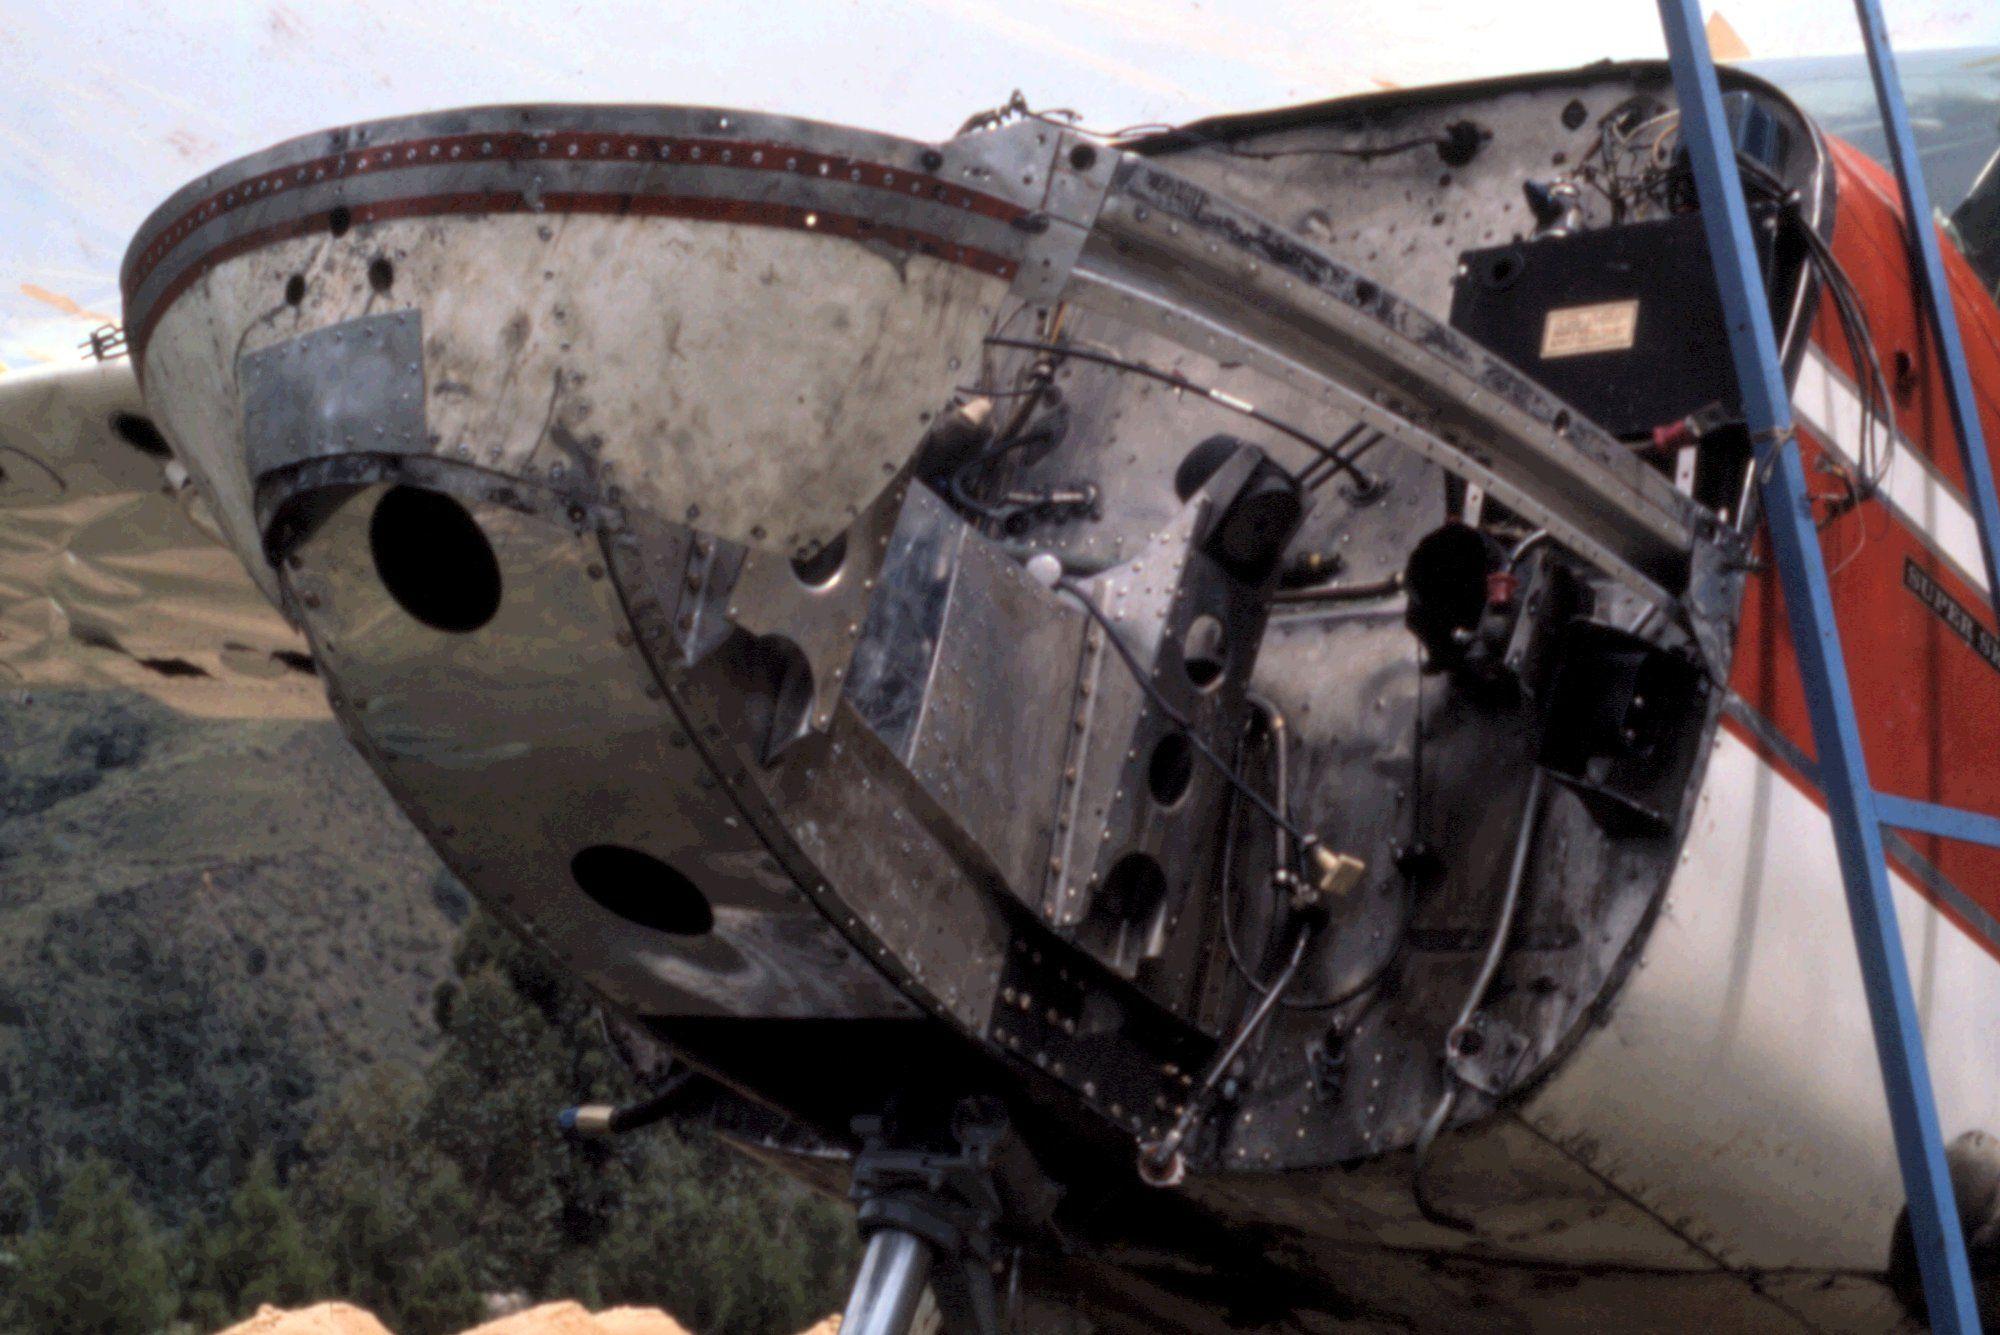 Aircraft repair during WW2 | Aircraft of World War II